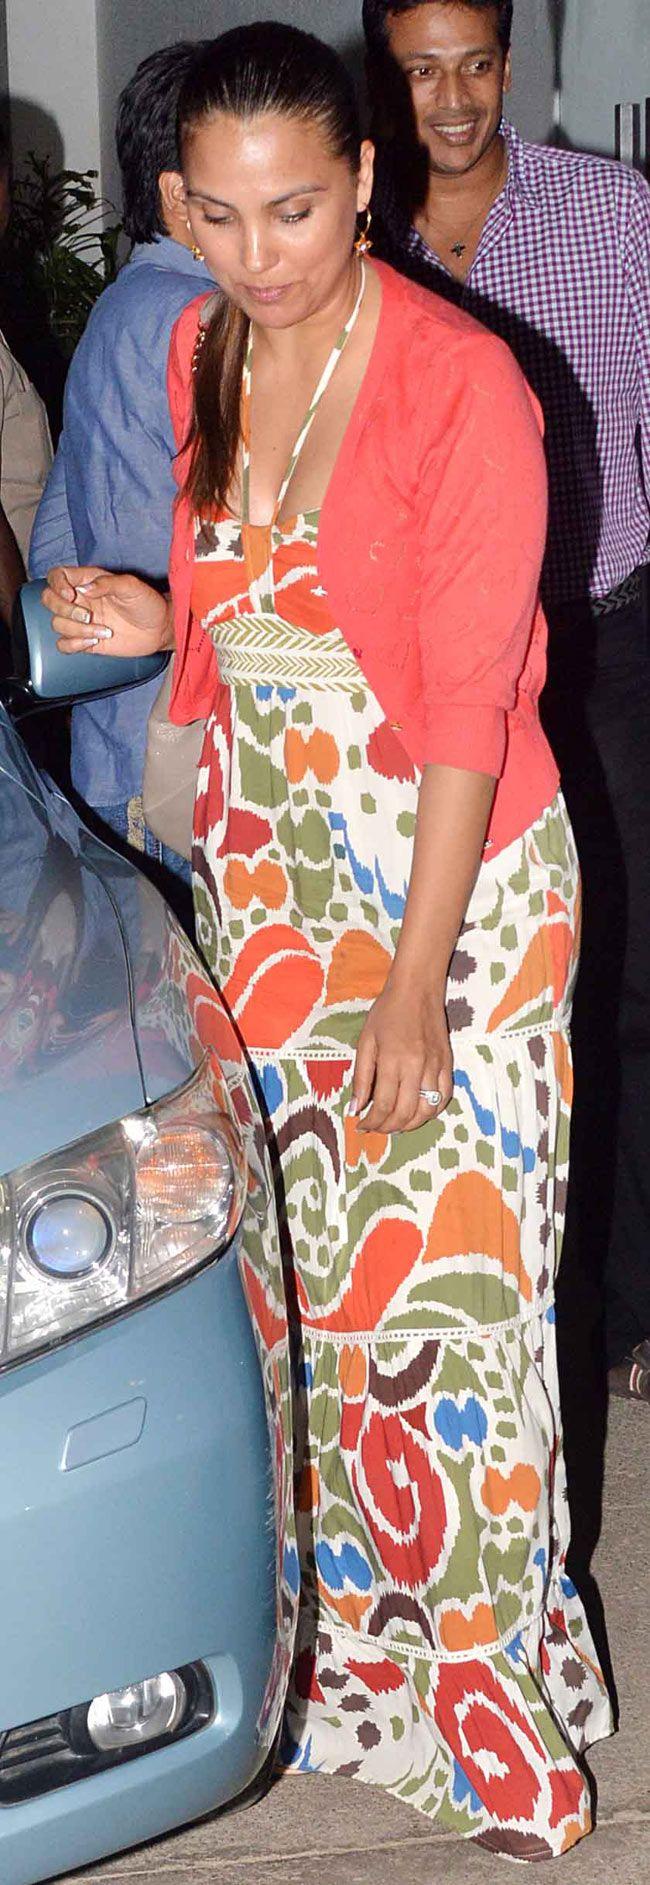 Lara Dutta and husband Mahesh Bhupathi at special screening of 'Ek Villain'. #Style #Bollywood #Fashion #Beauty